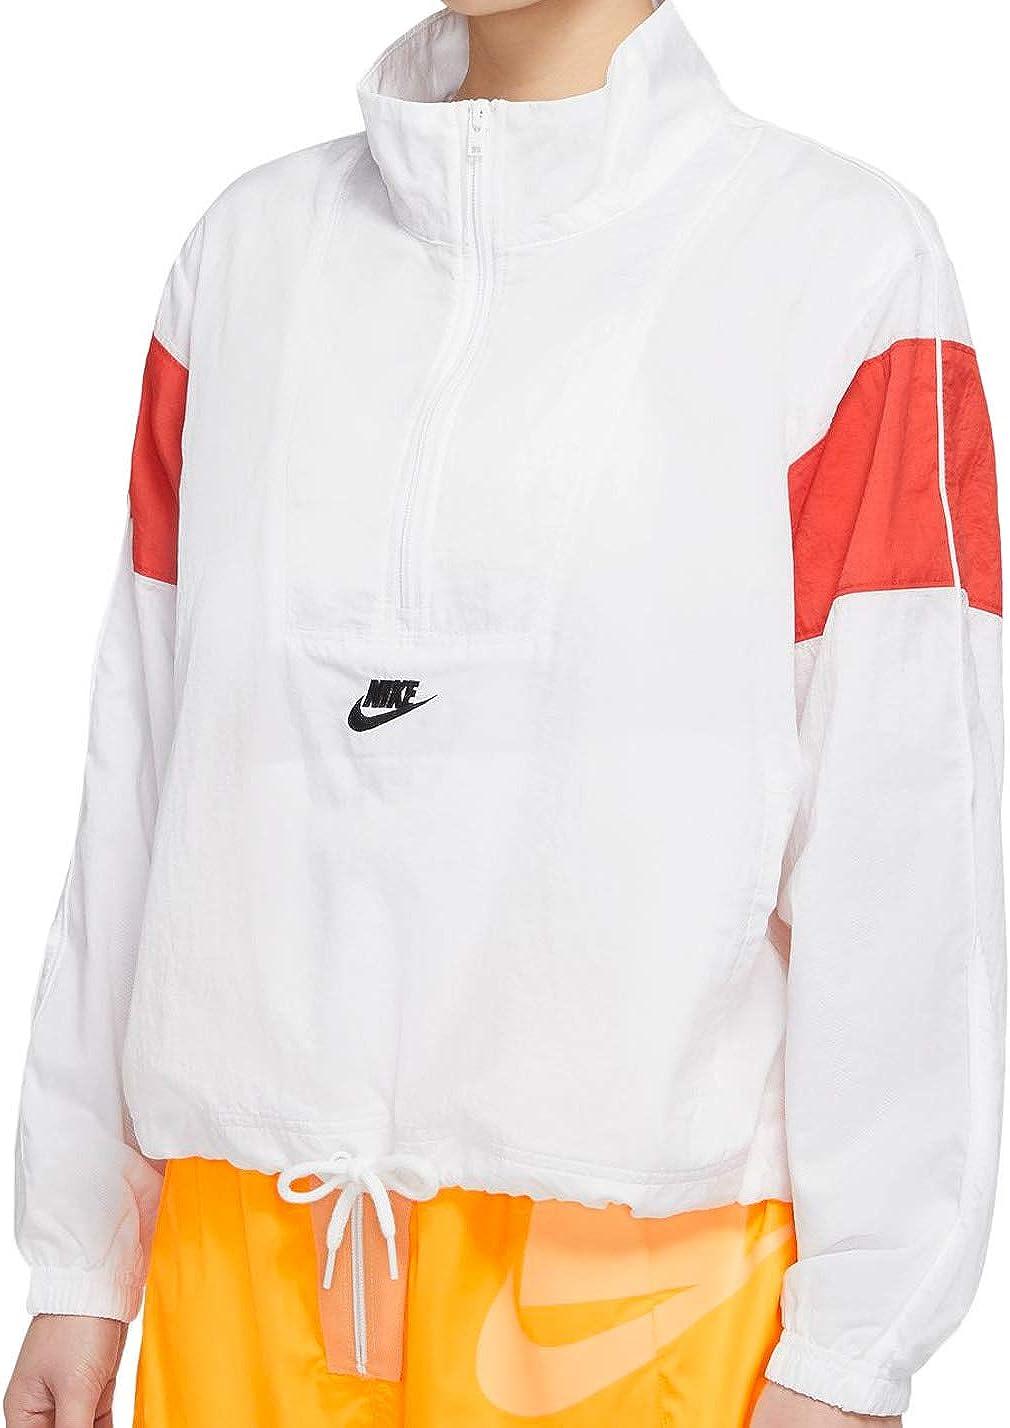 Amplia gama Decisión Precipicio  Nike Women's Sportswear Woven Heritage Wind Jacket Cj2361-100 at Amazon  Women's Clothing store